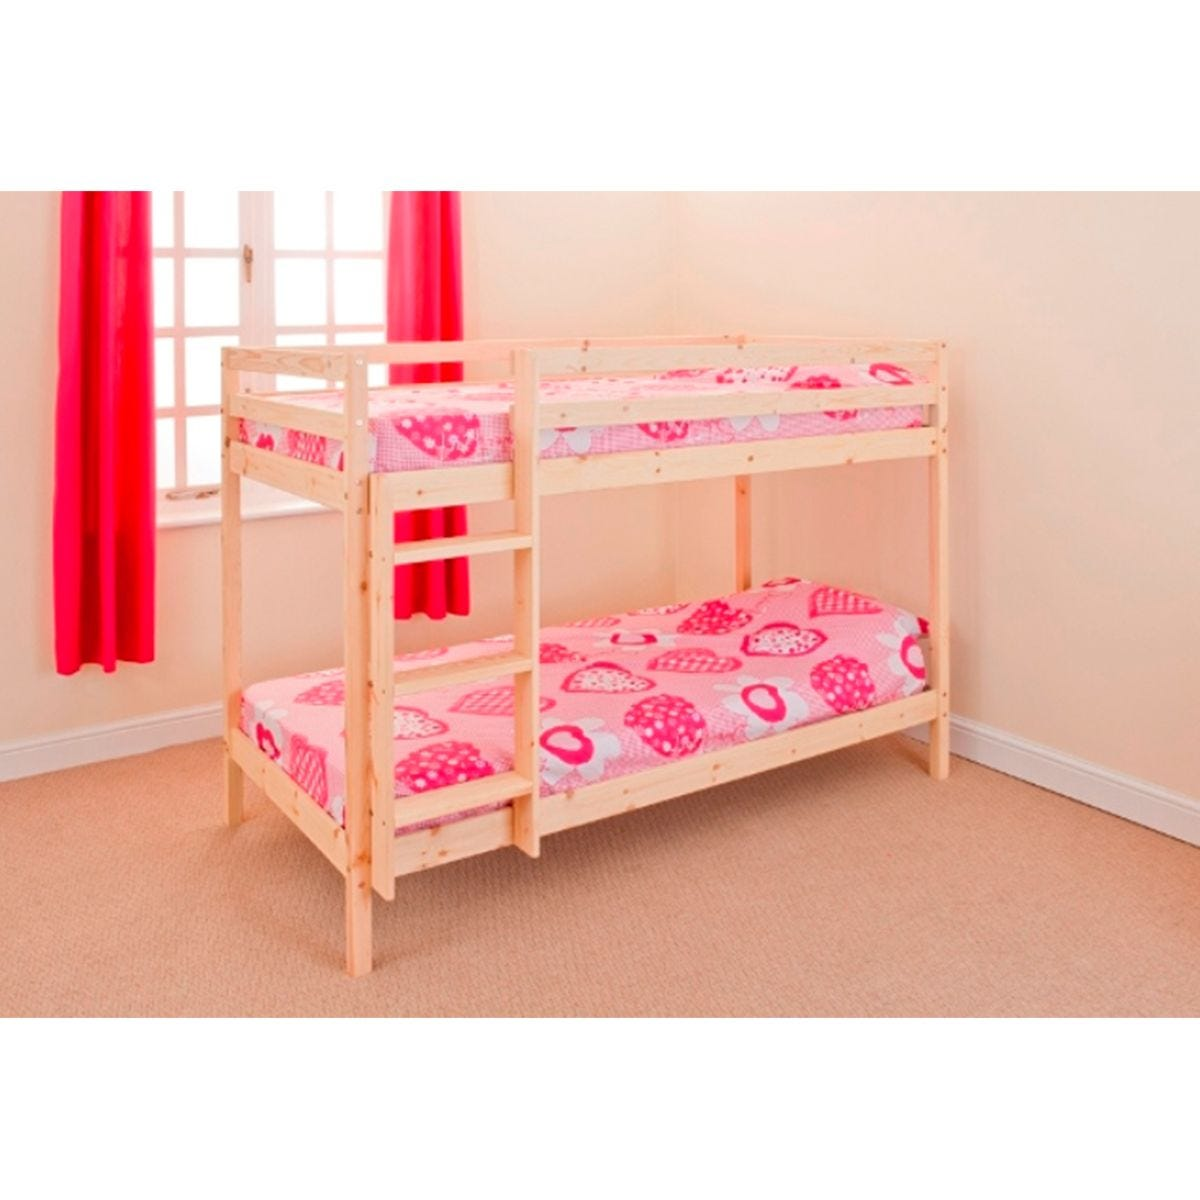 Hillingdon Bunk Bed - Caramel